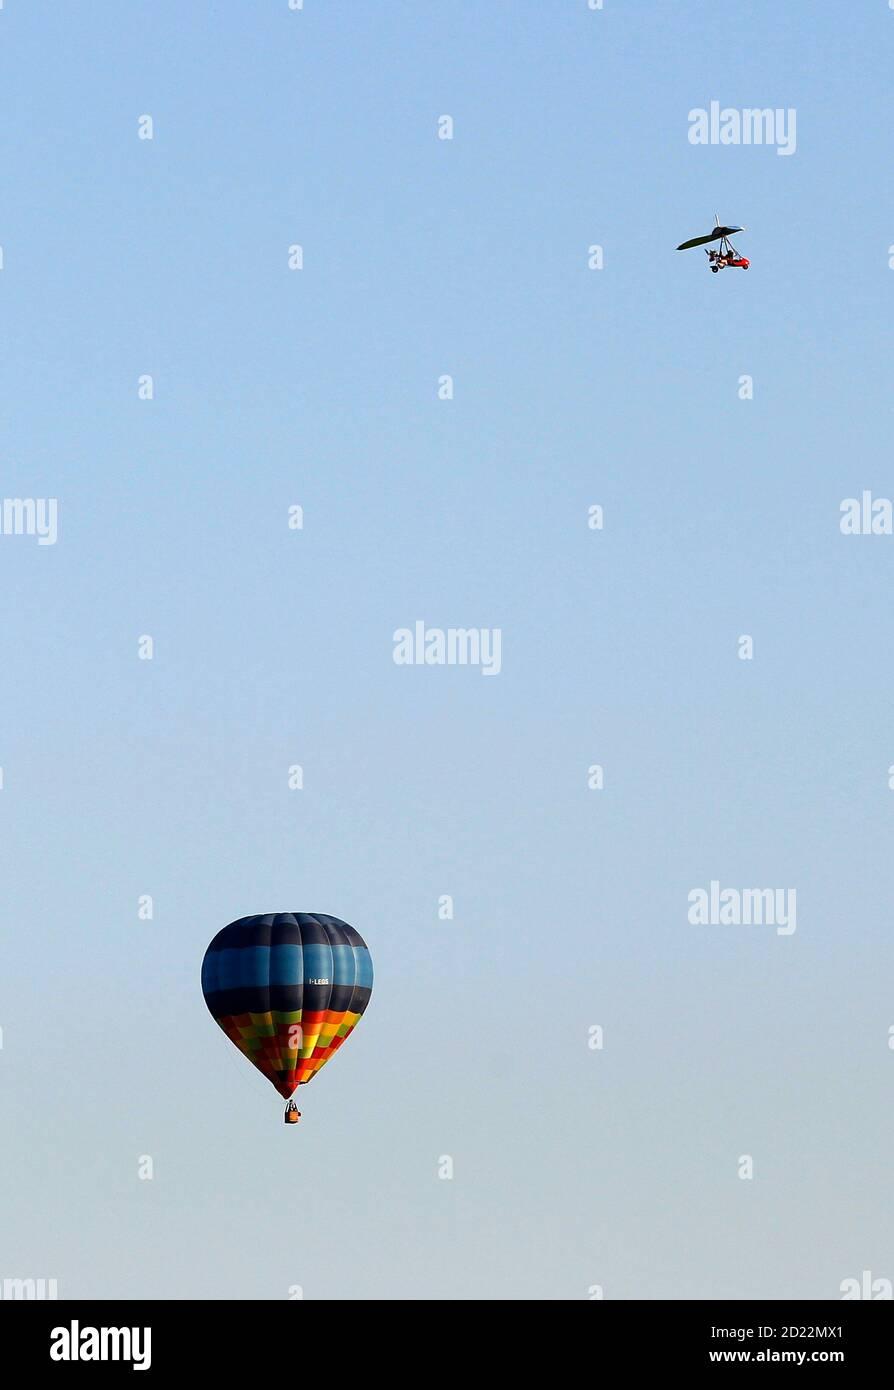 An ultralight aircraft flies near a hot air balloon over Alessandria May 22, 2010.   REUTERS/Alessandro Bianchi   (ITALY - Tags: SOCIETY TRANSPORT) Foto de stock